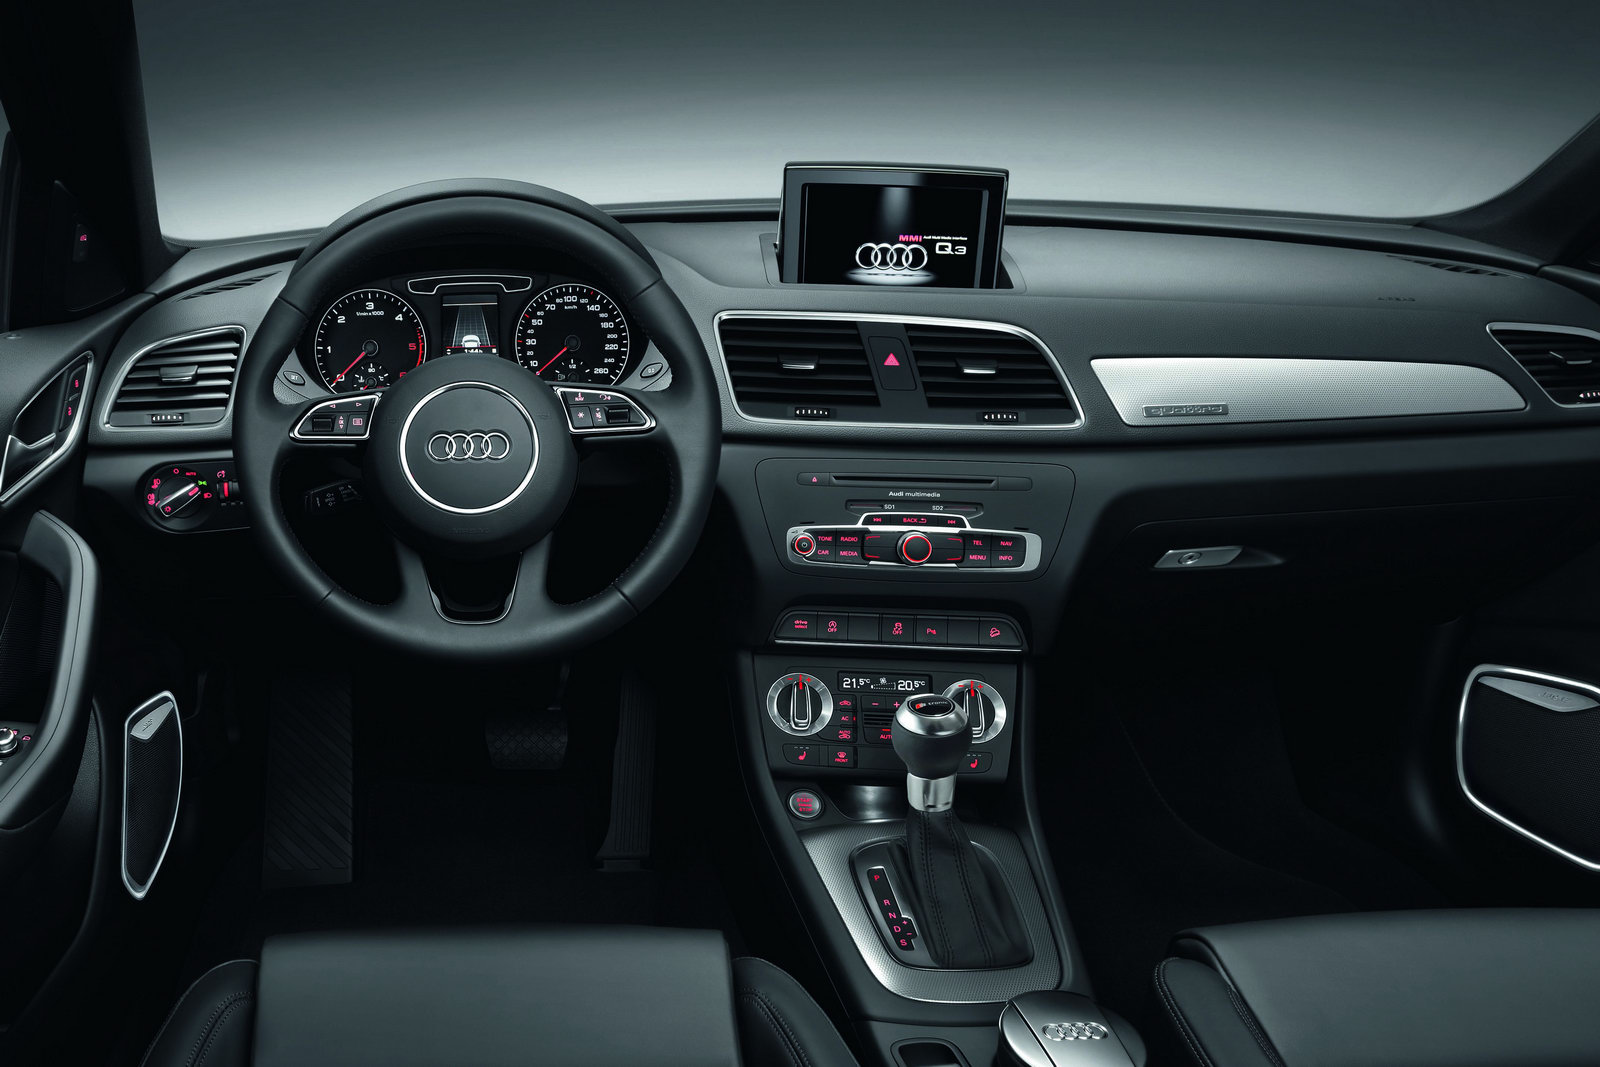 Kelebihan Audi Q3 2011 Review